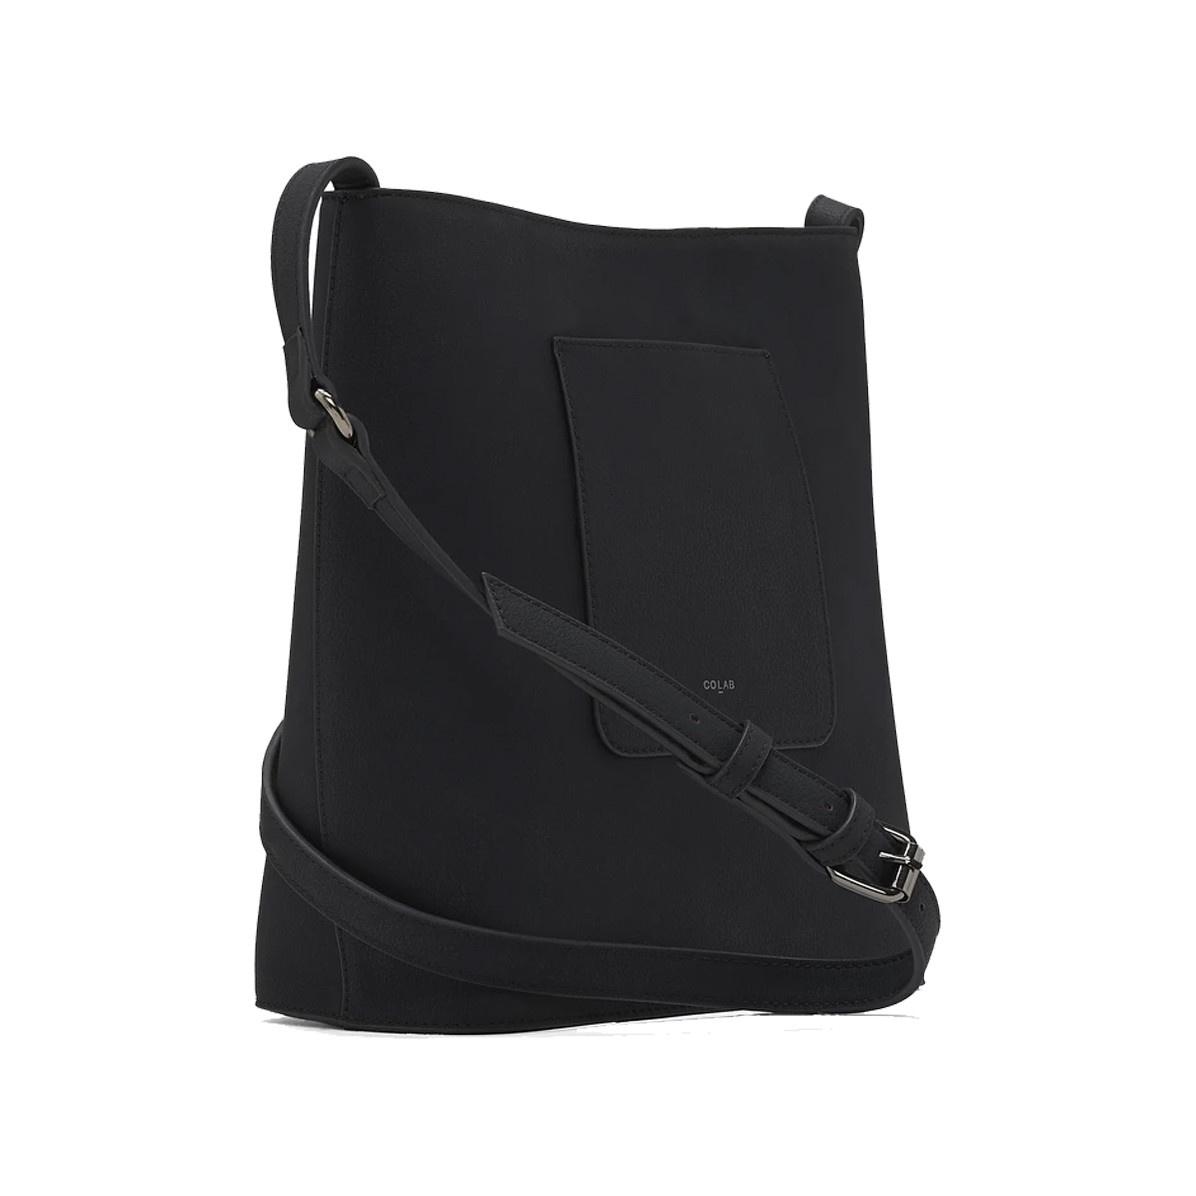 Colab Colab Hobo Bucket Vegan Leather Crossbody